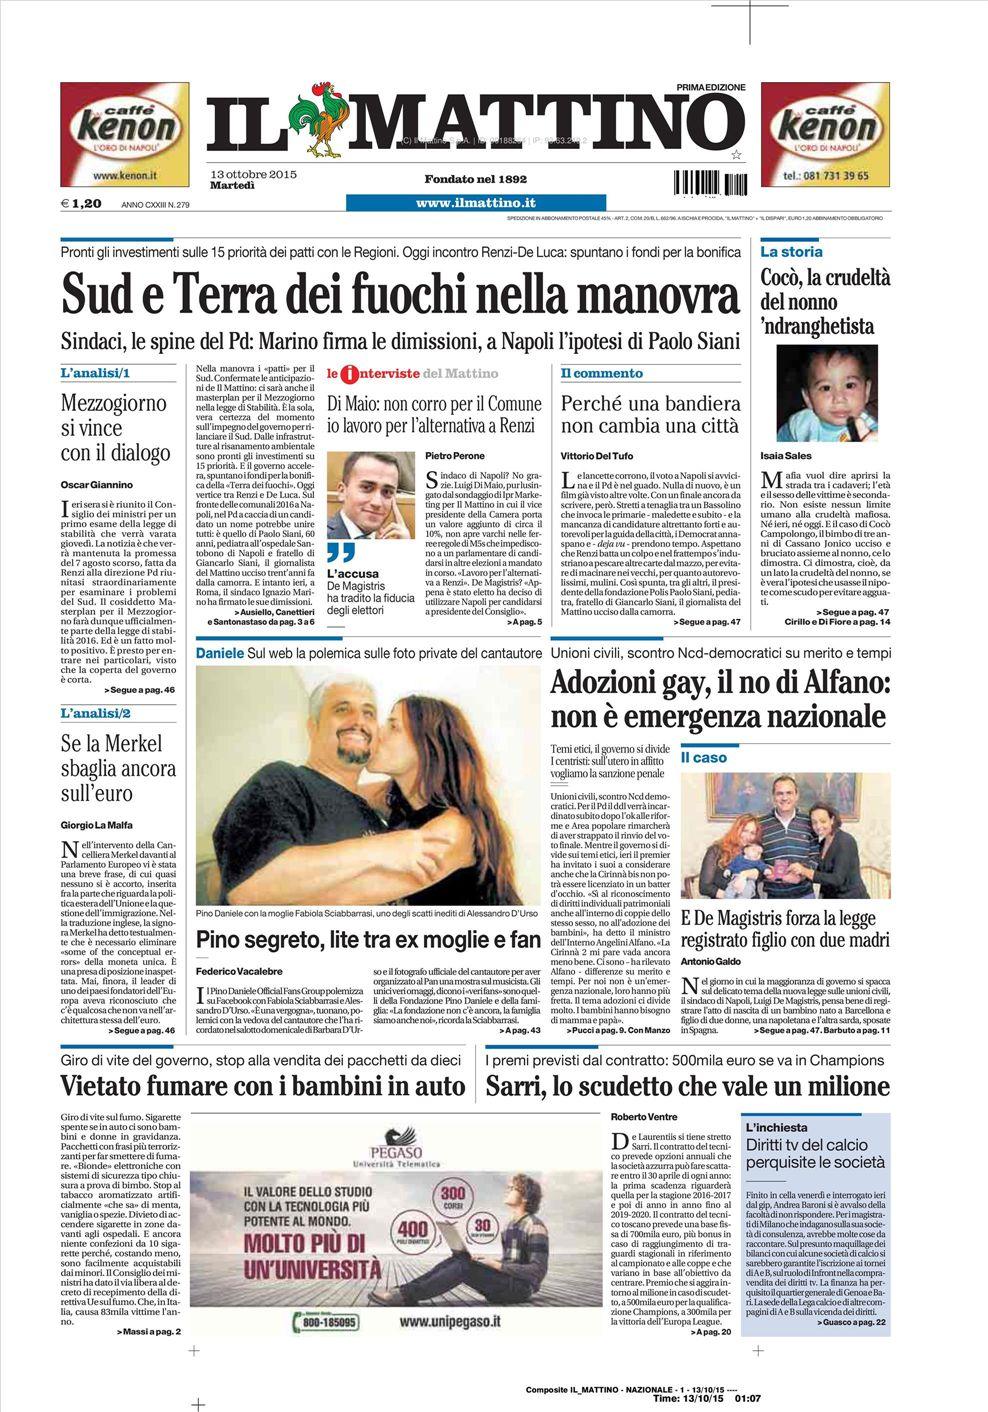 matrimoni omosessuali in italia 2016 La Spezia